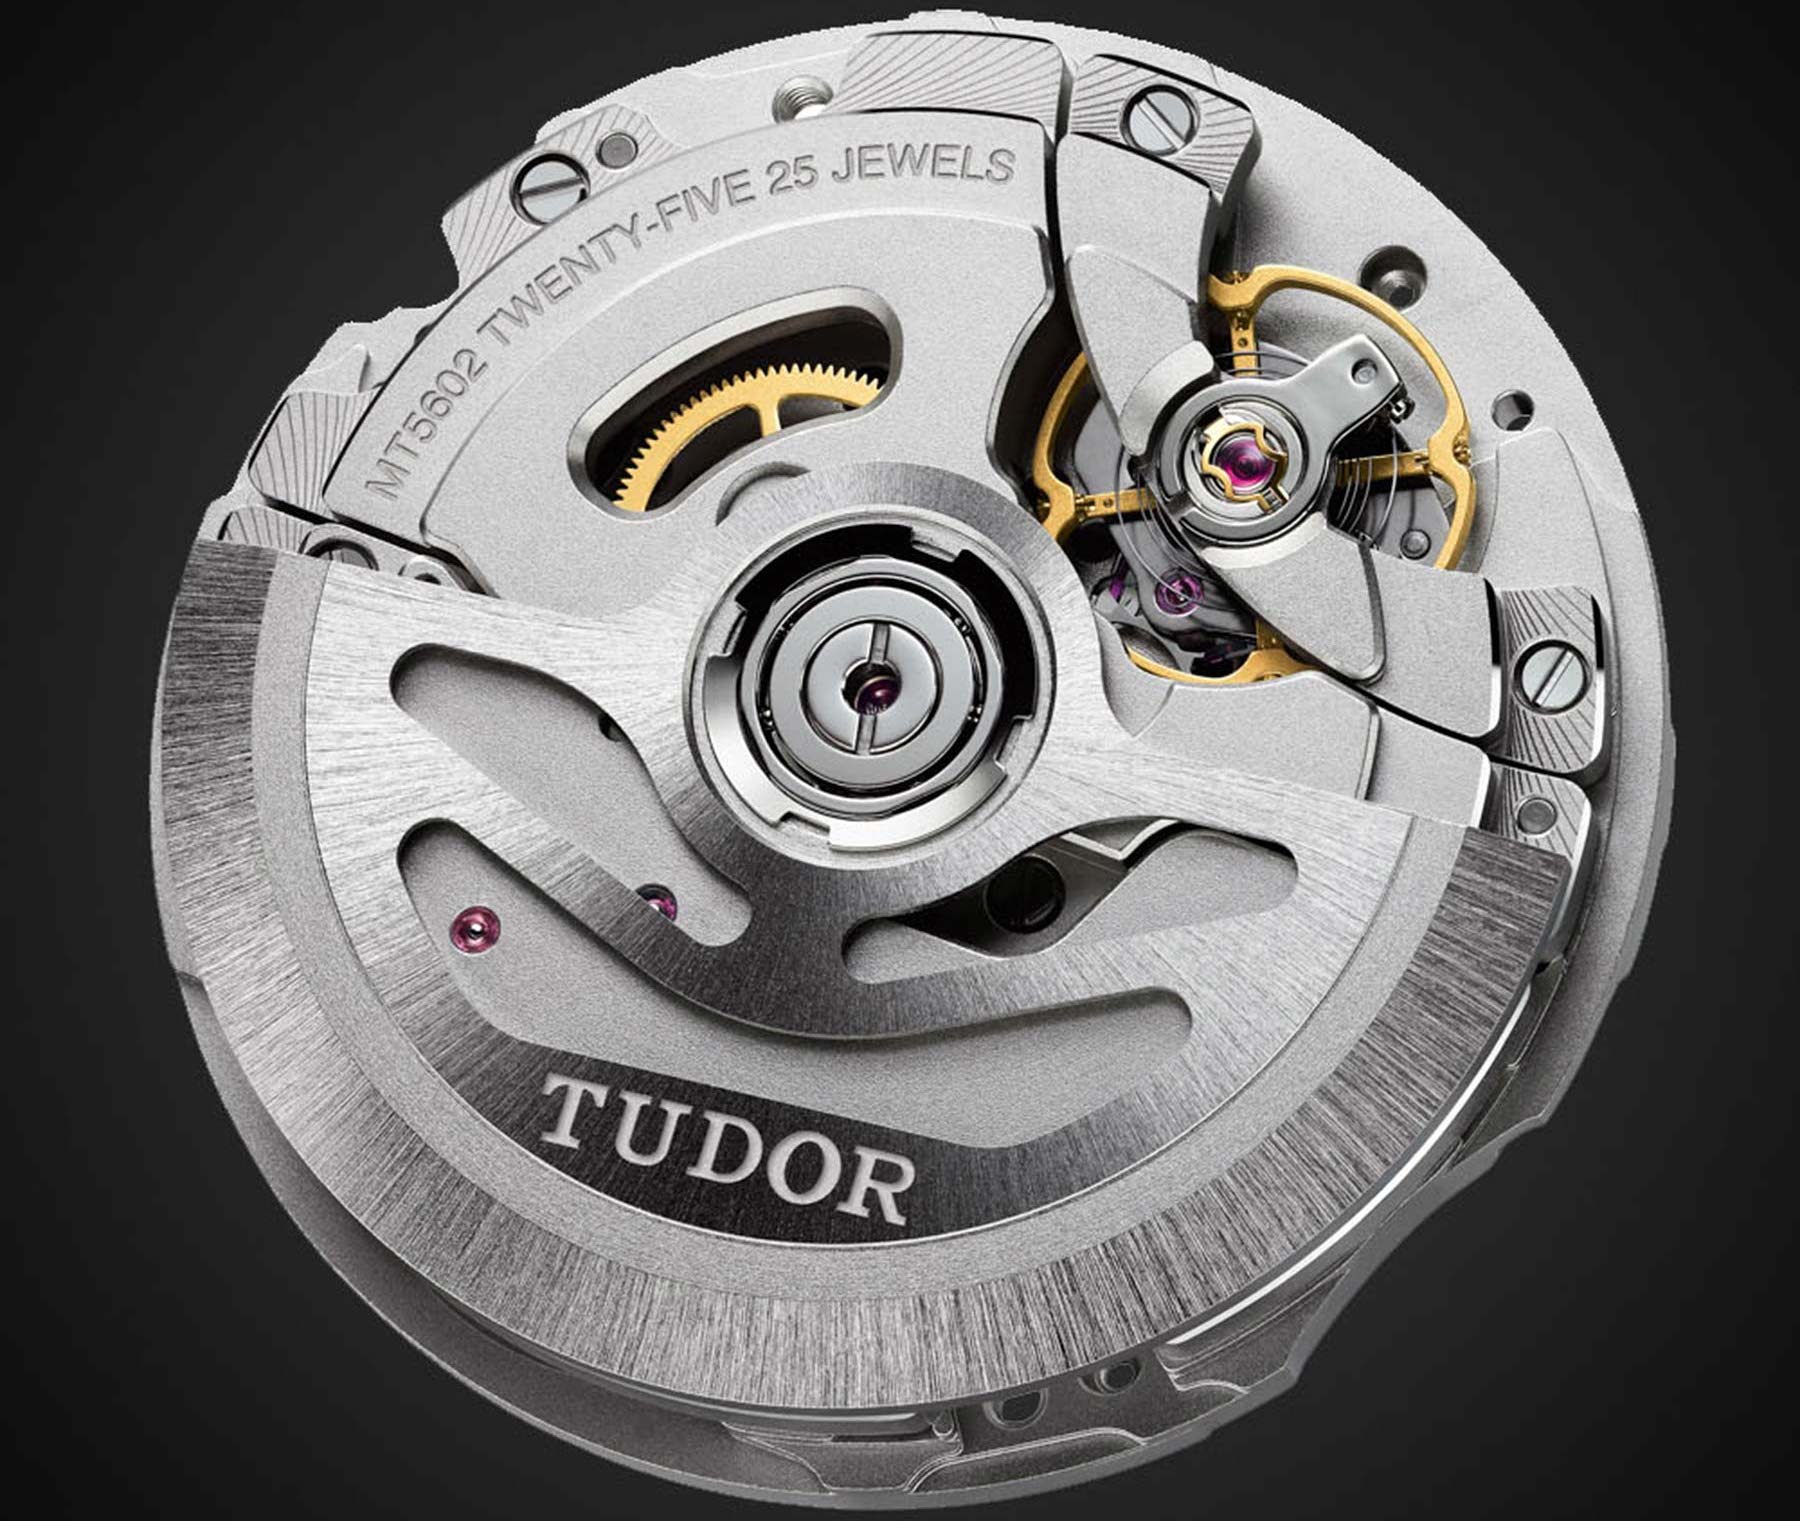 Tudor in-house calibers